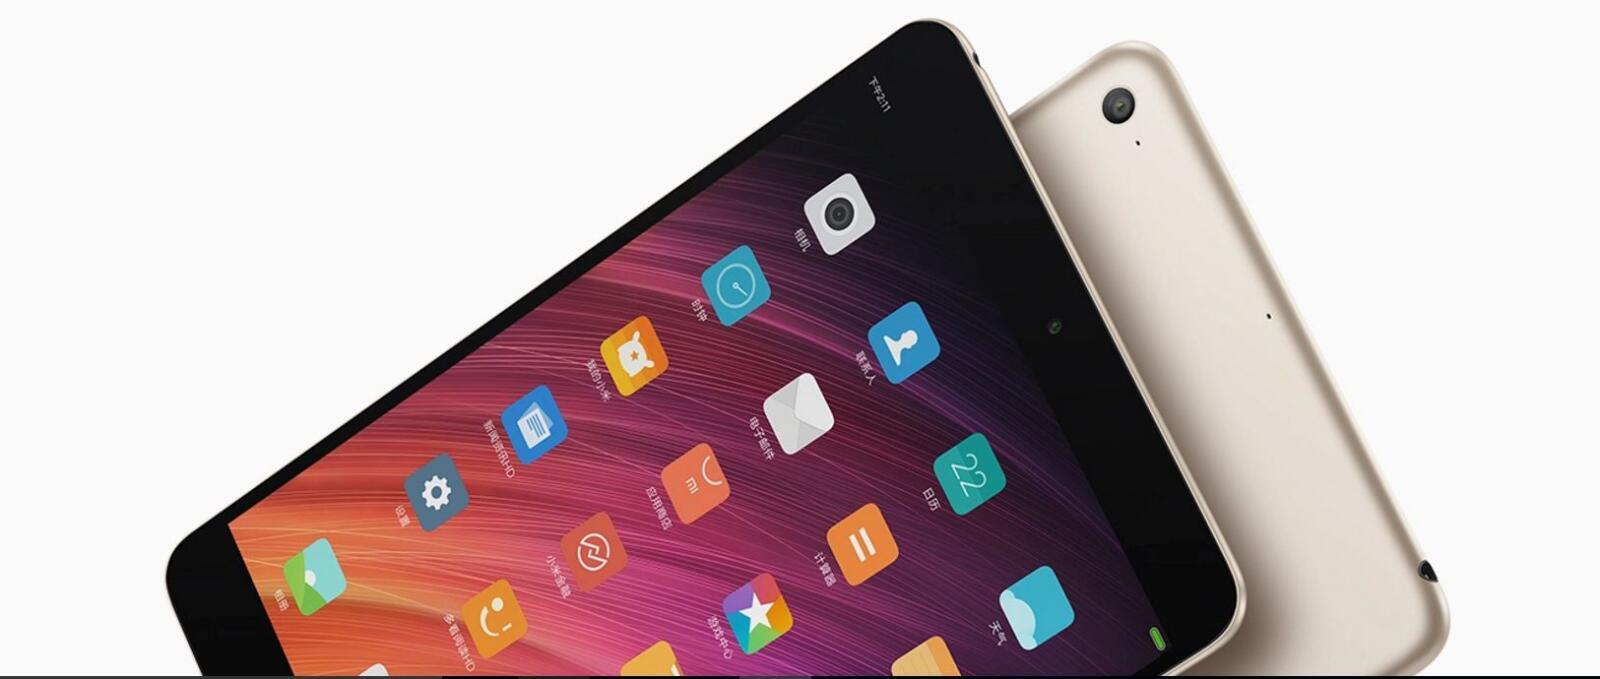 Android Mi Pad 3 MIUI 8 xiaomi